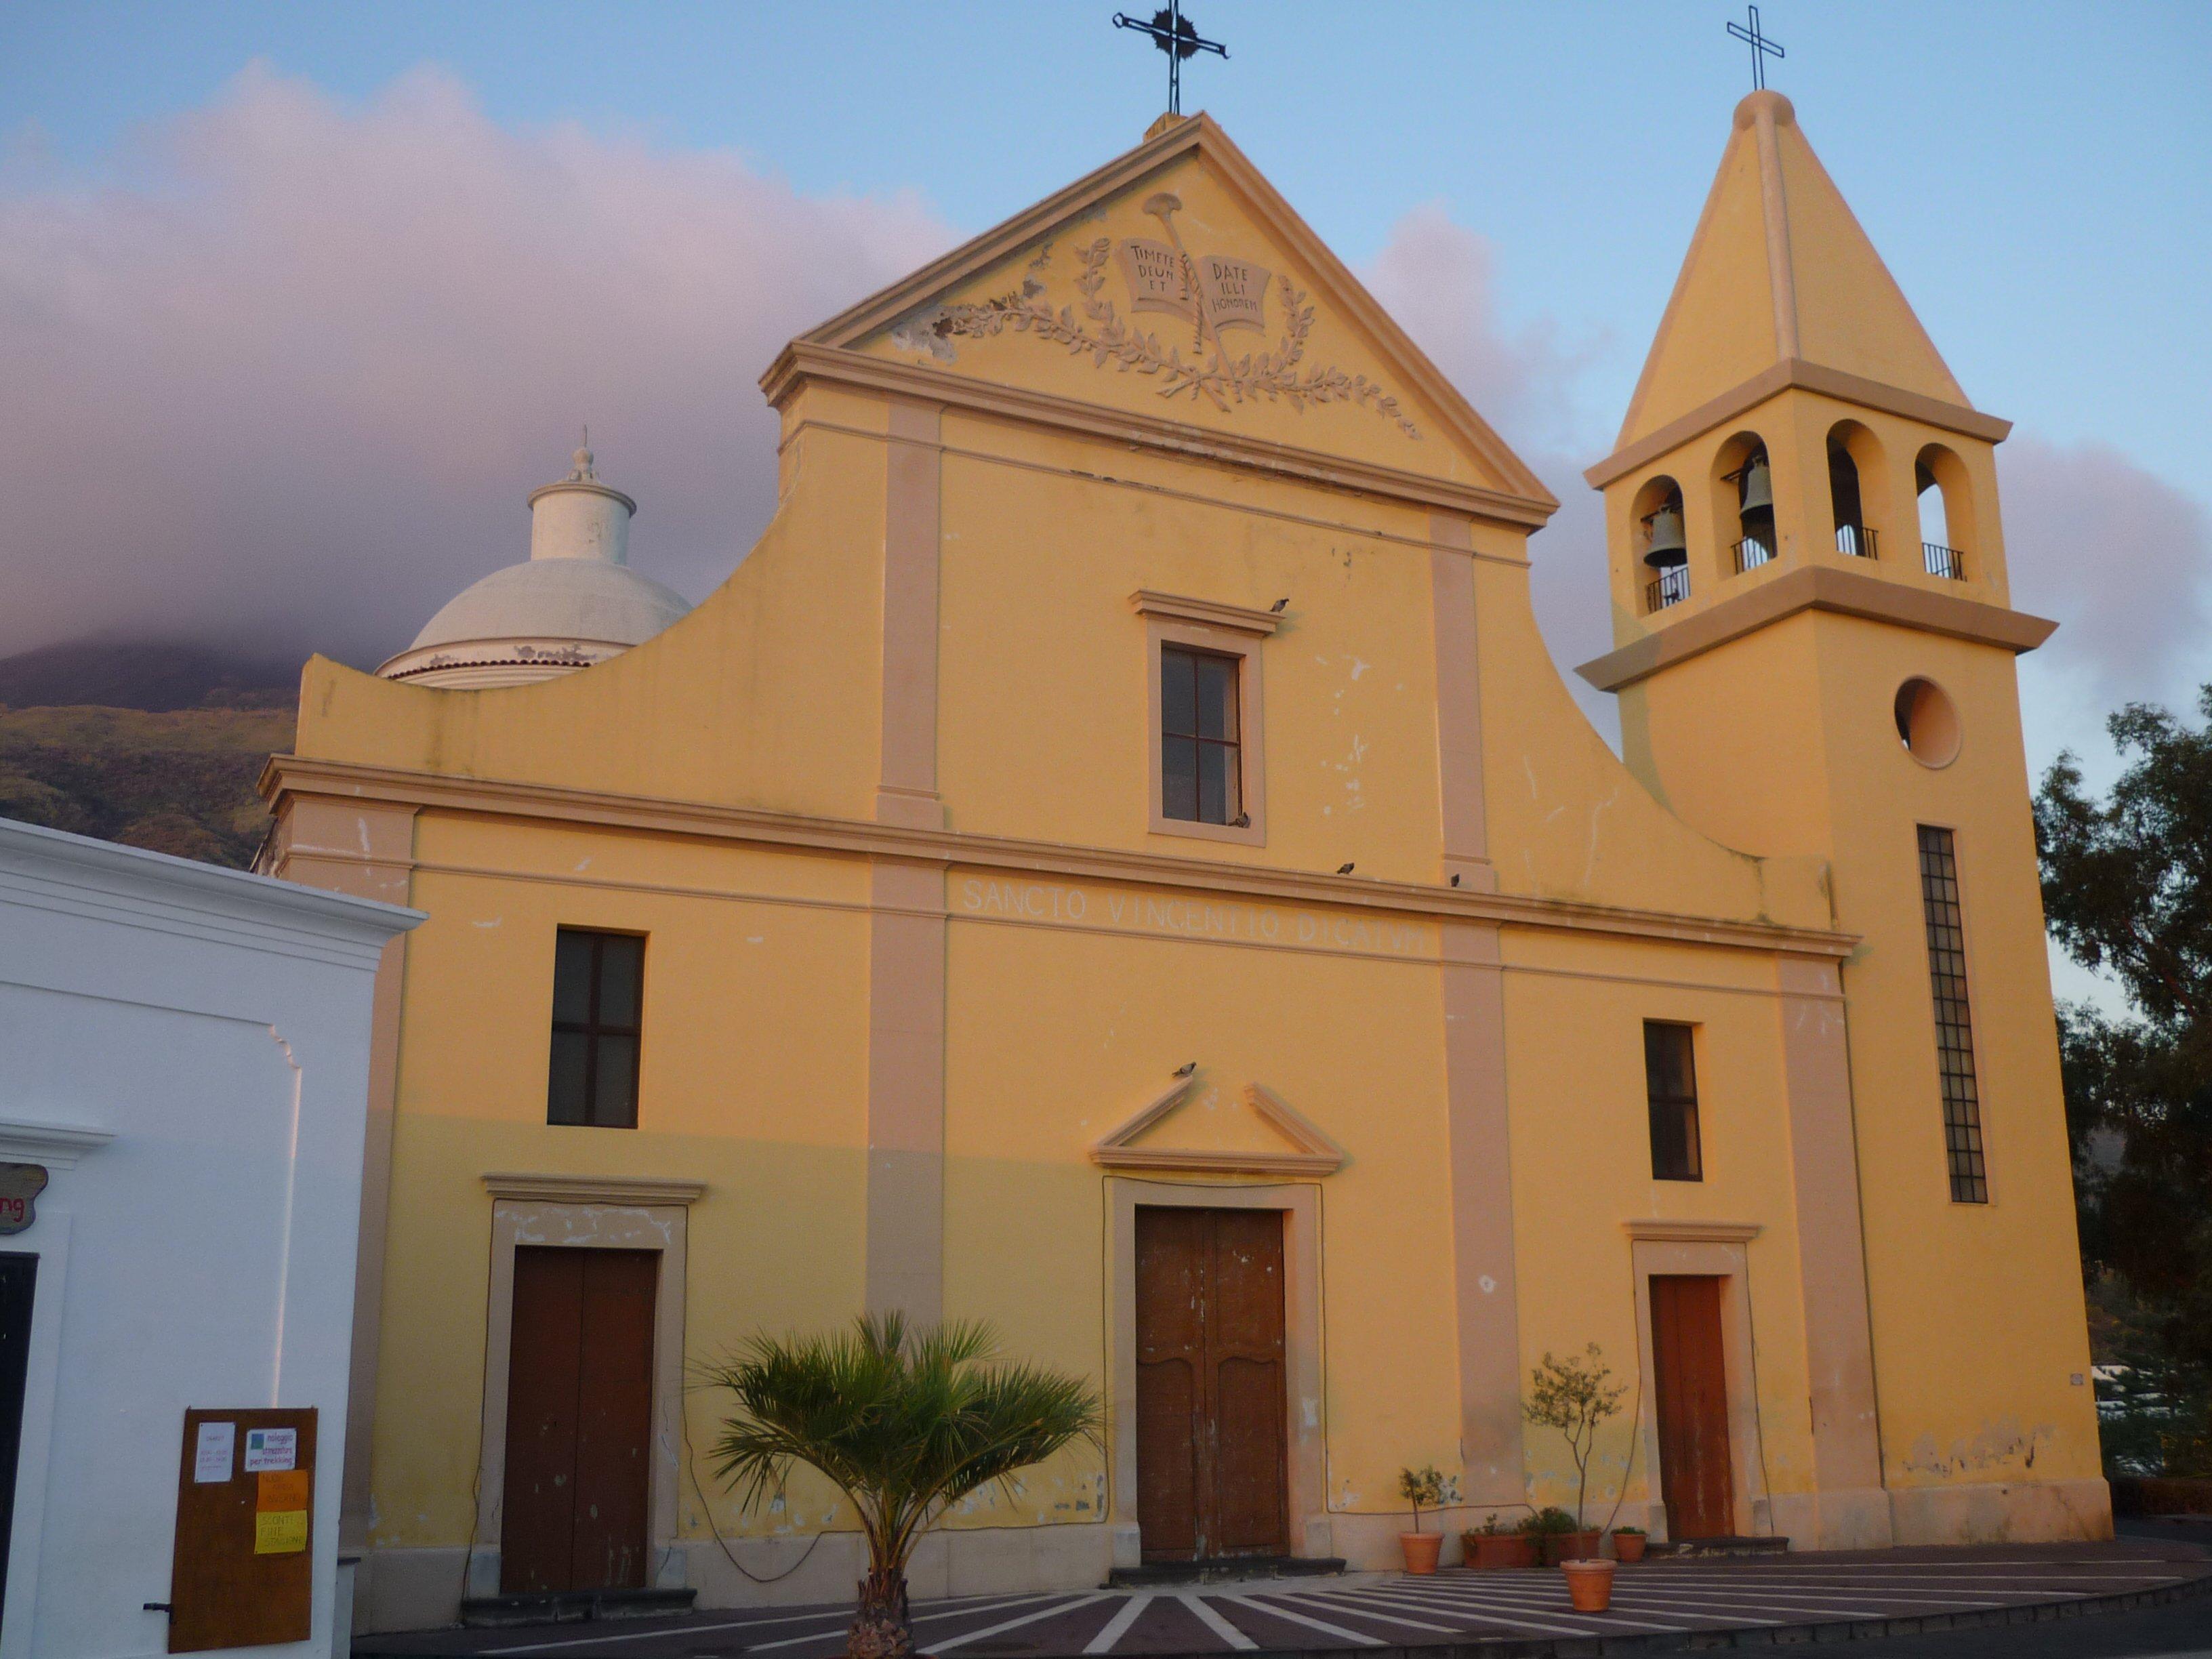 Stromboli San Vincenzo